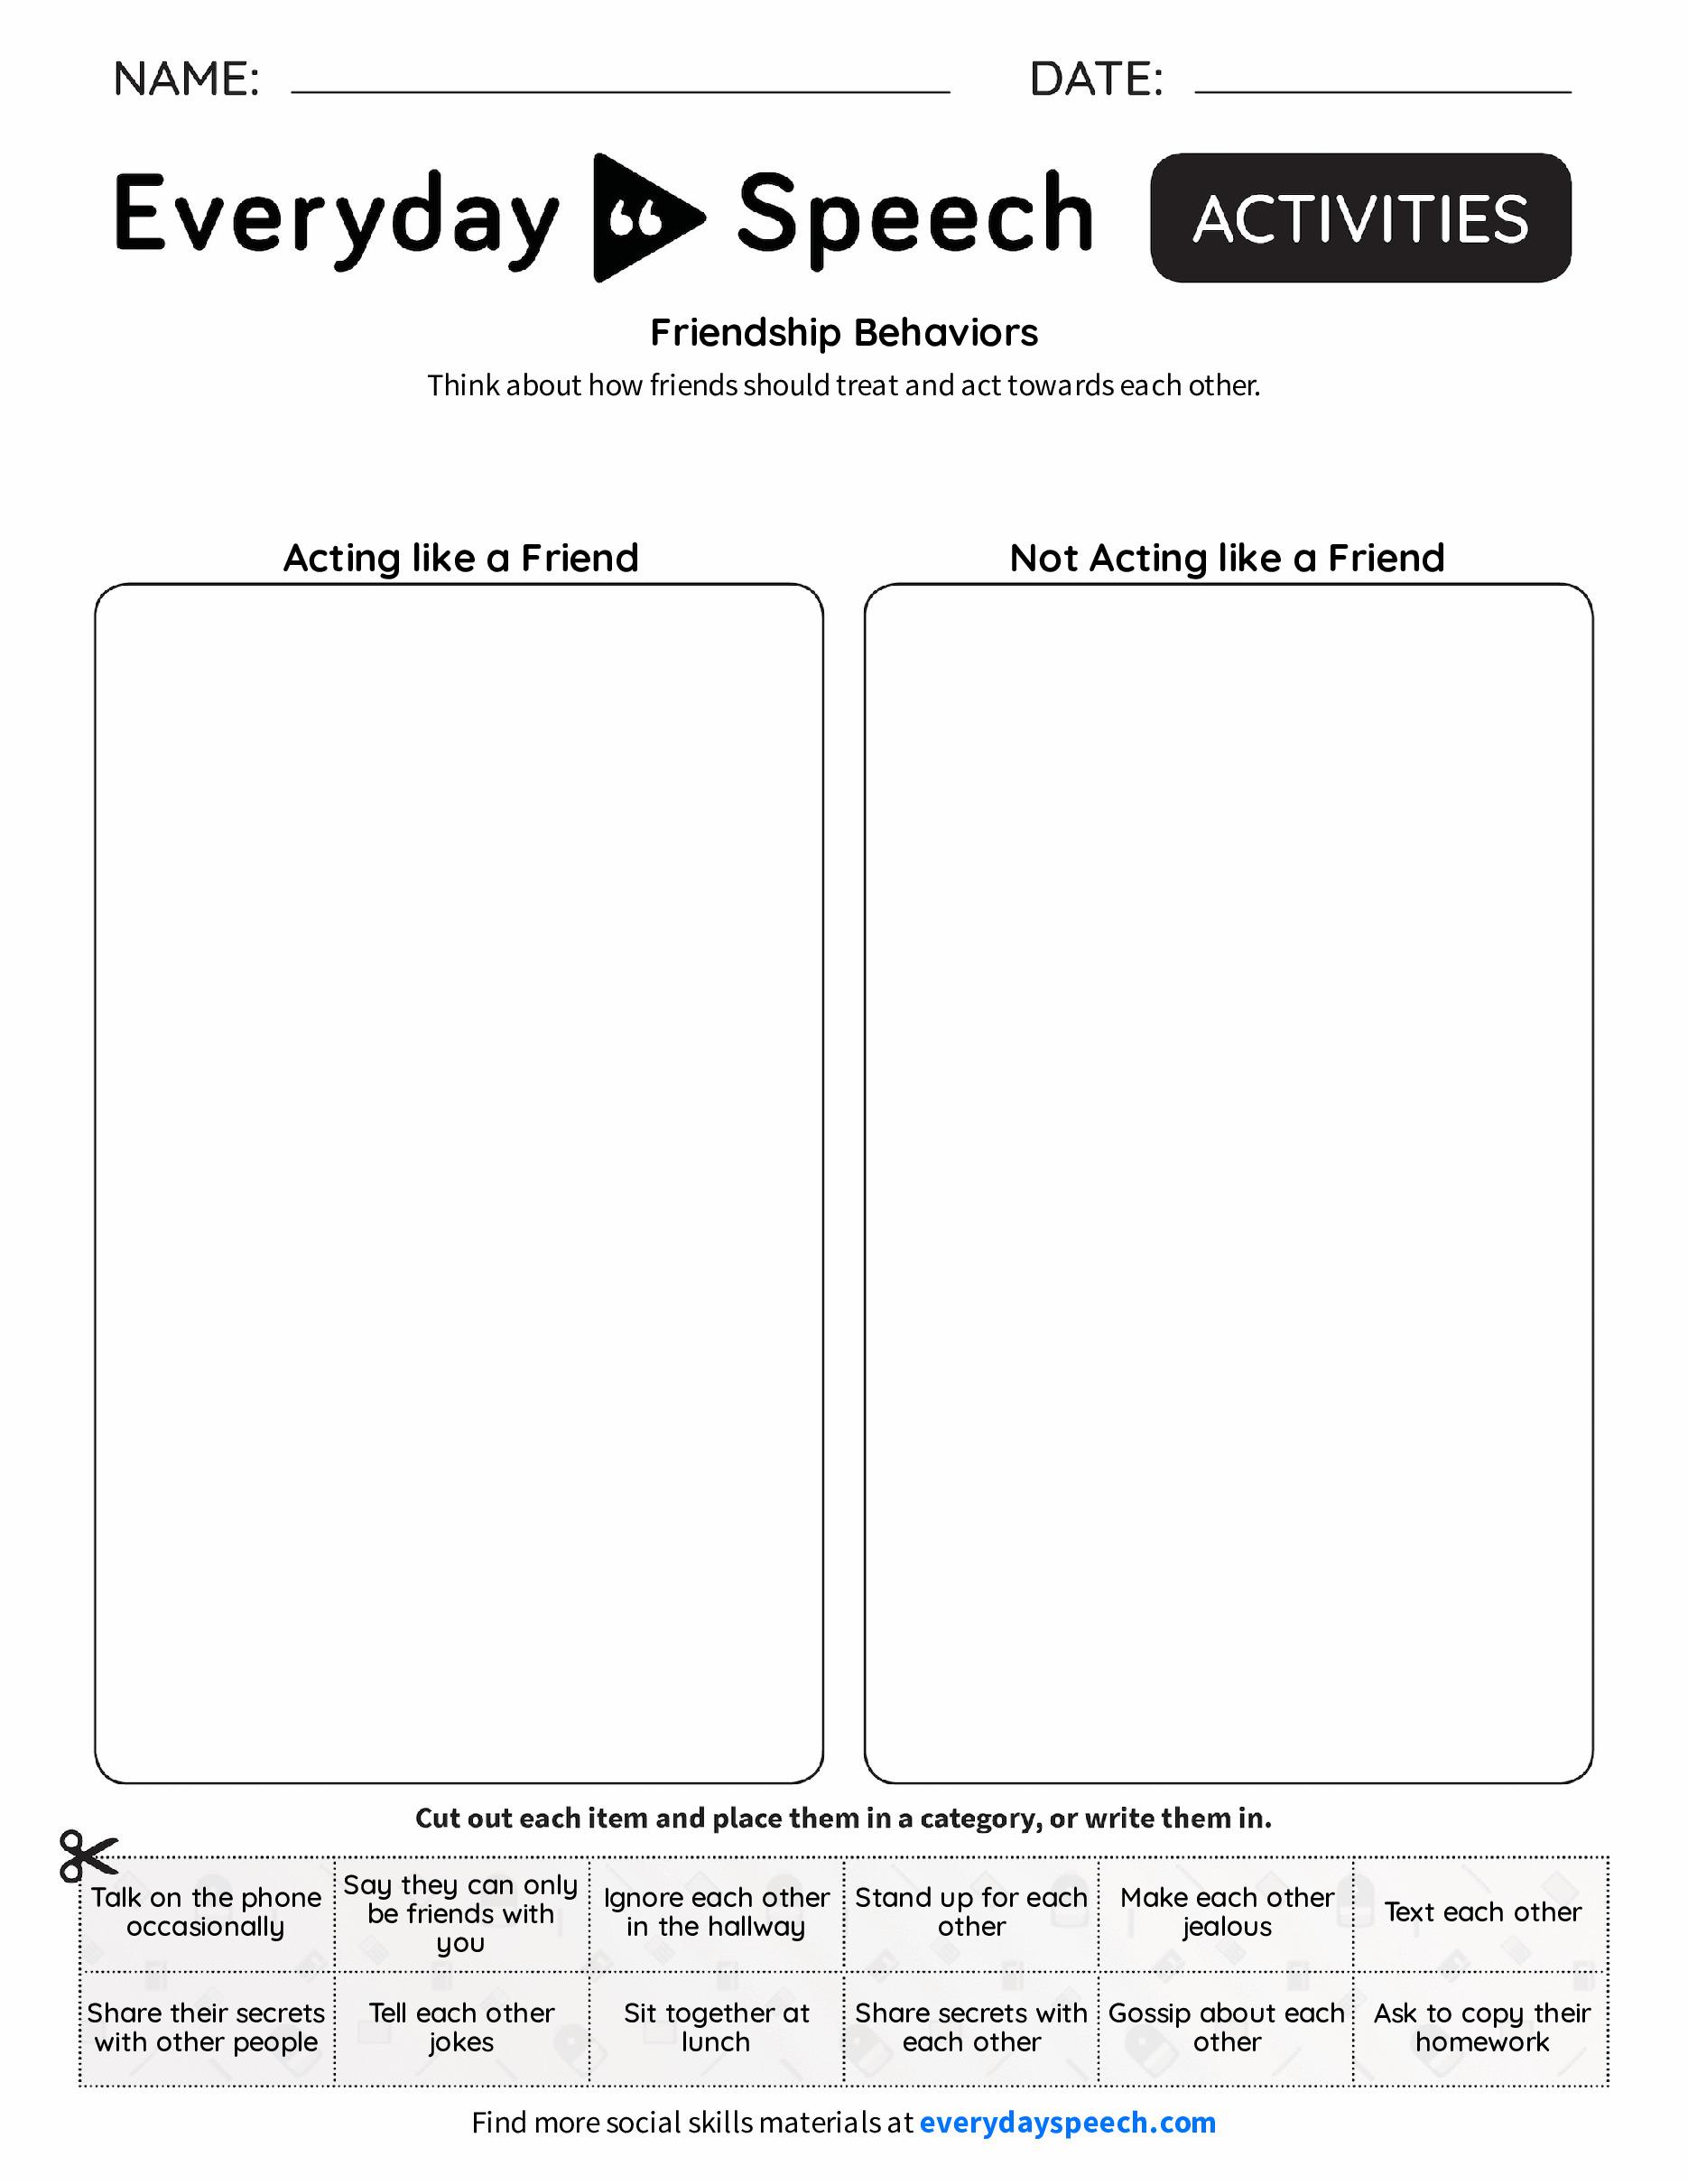 Friendship Behaviors - Everyday Speech - Everyday Speech